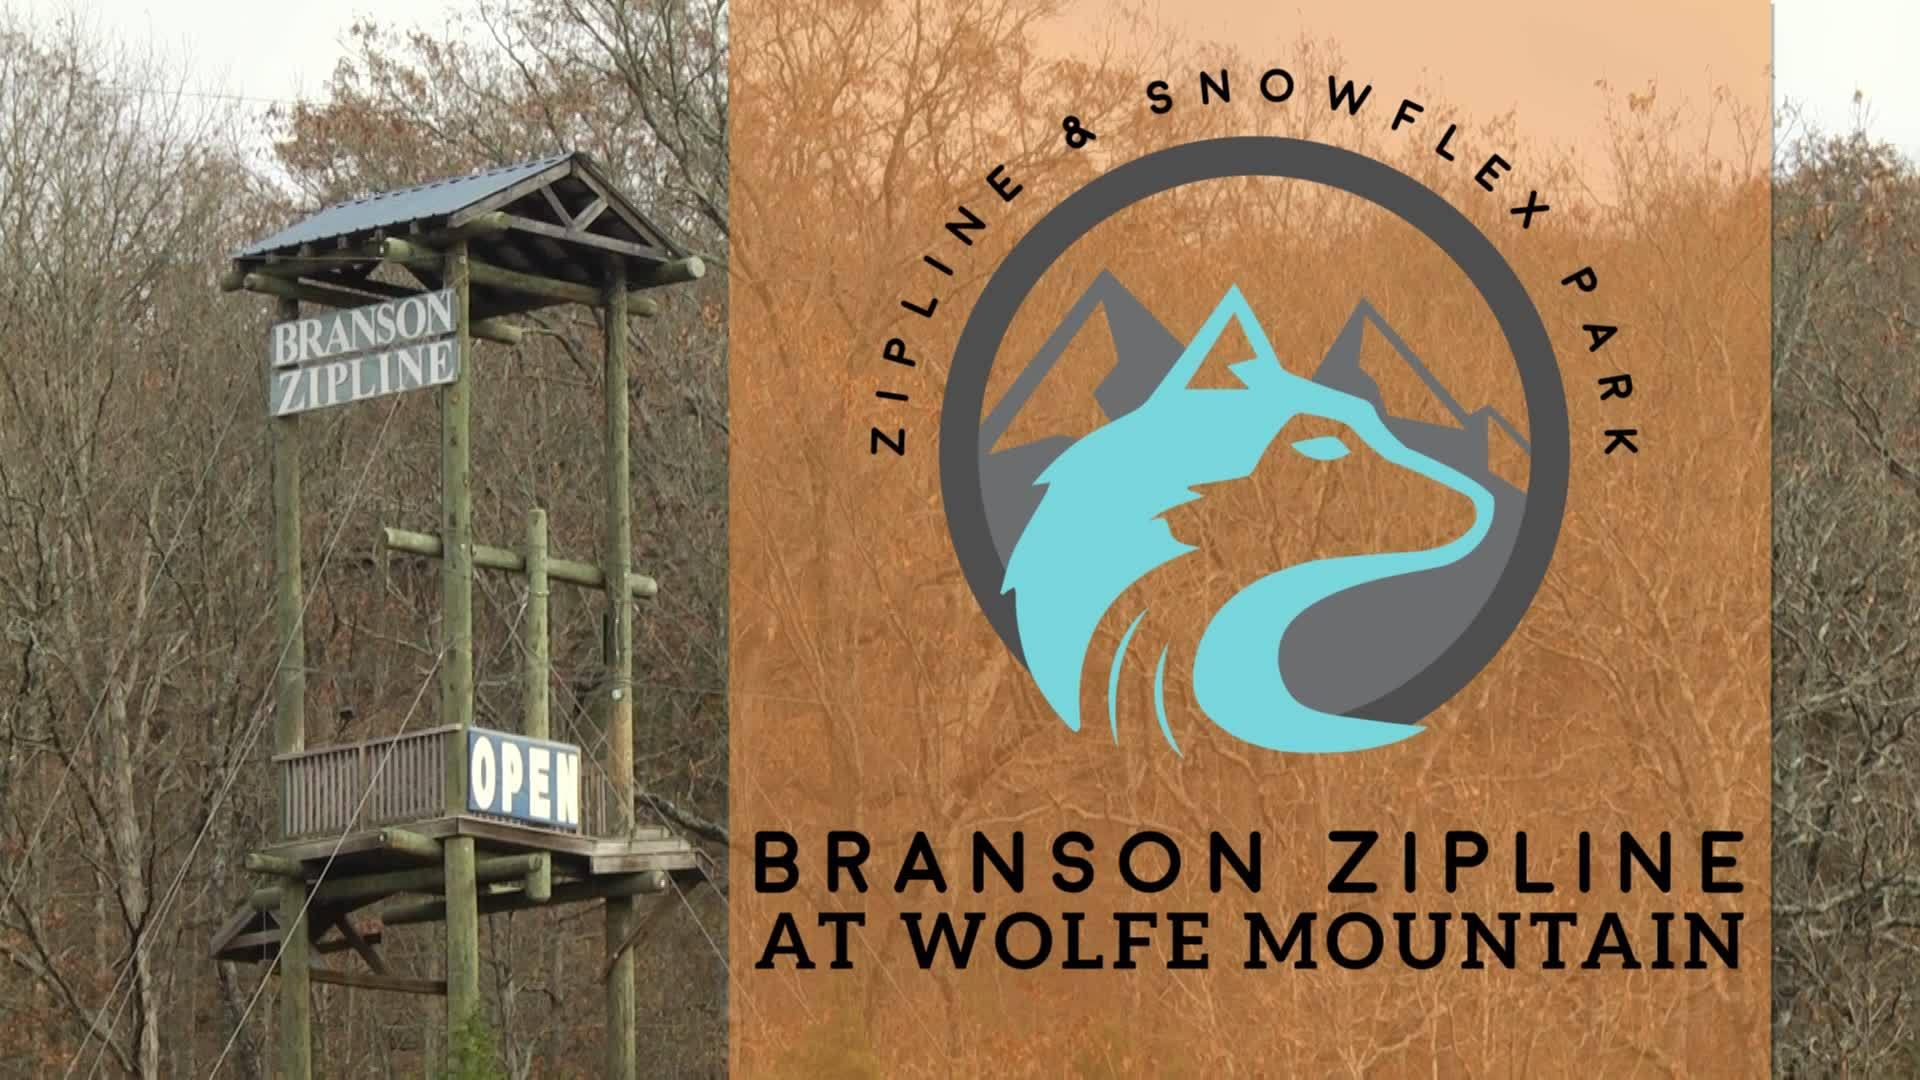 Wolfe_Mountain_Snowflex_Park_in_Branson__0_20180125204934